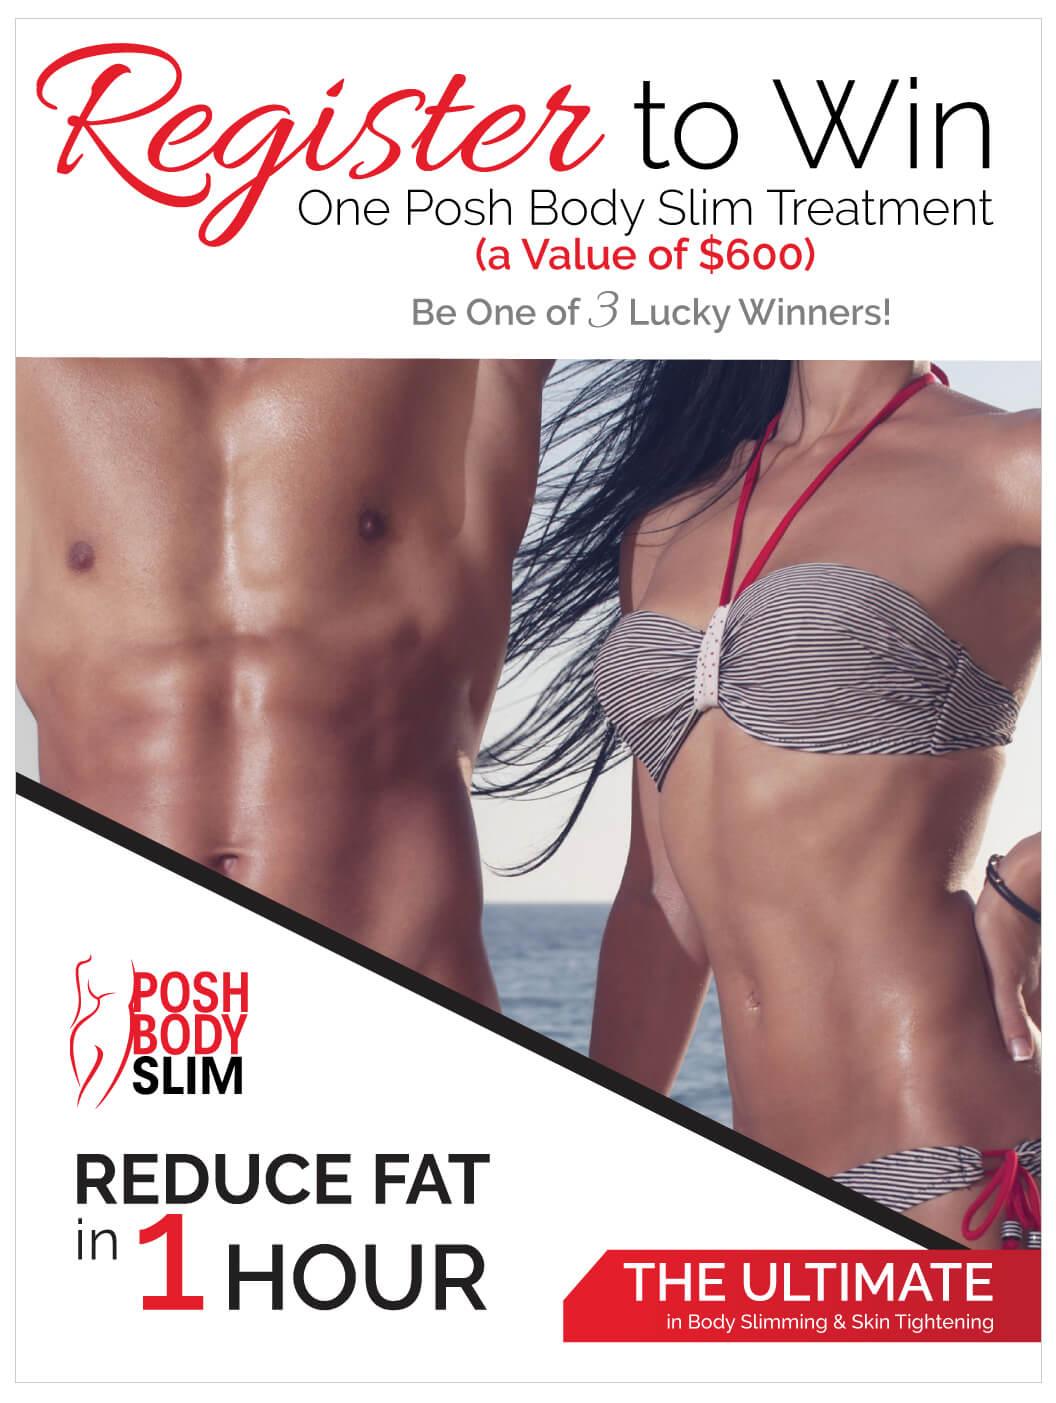 Register To Win one Posh Body Slim Treatment